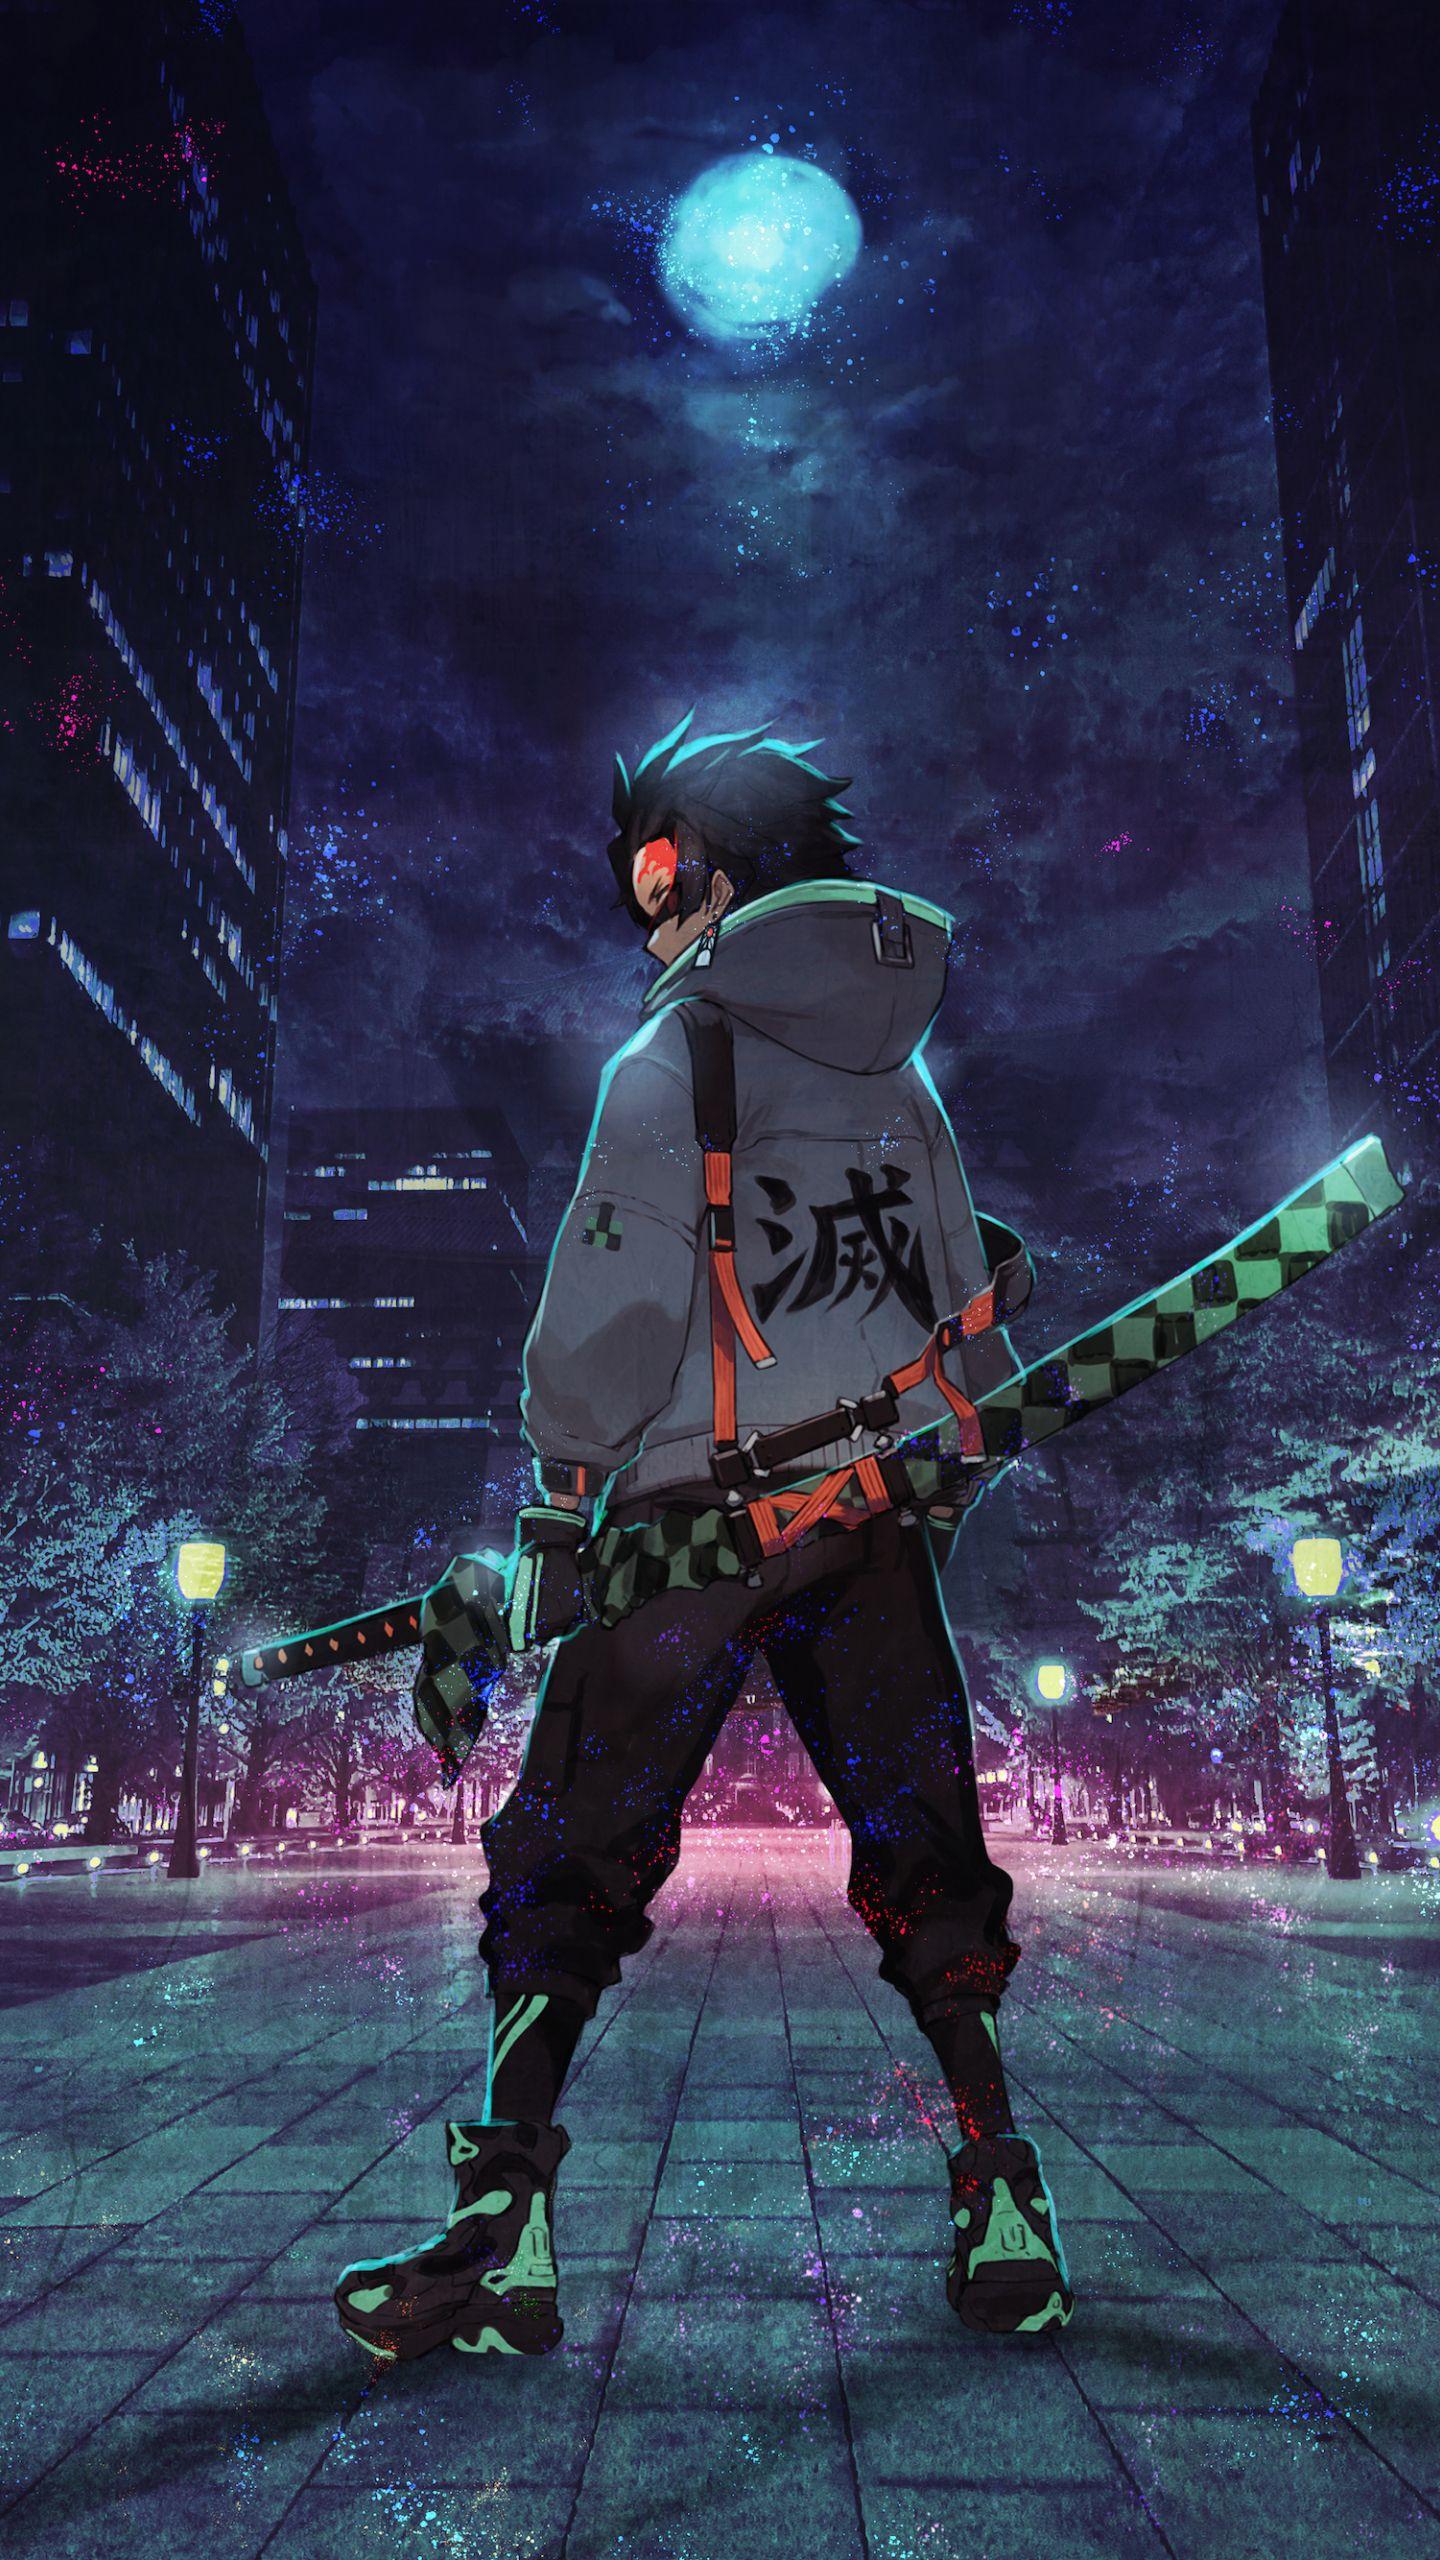 1440x2560 Urban Ninja Anime Art Wallpaper Anime Wallpaper Cool Anime Wallpapers Anime Movies